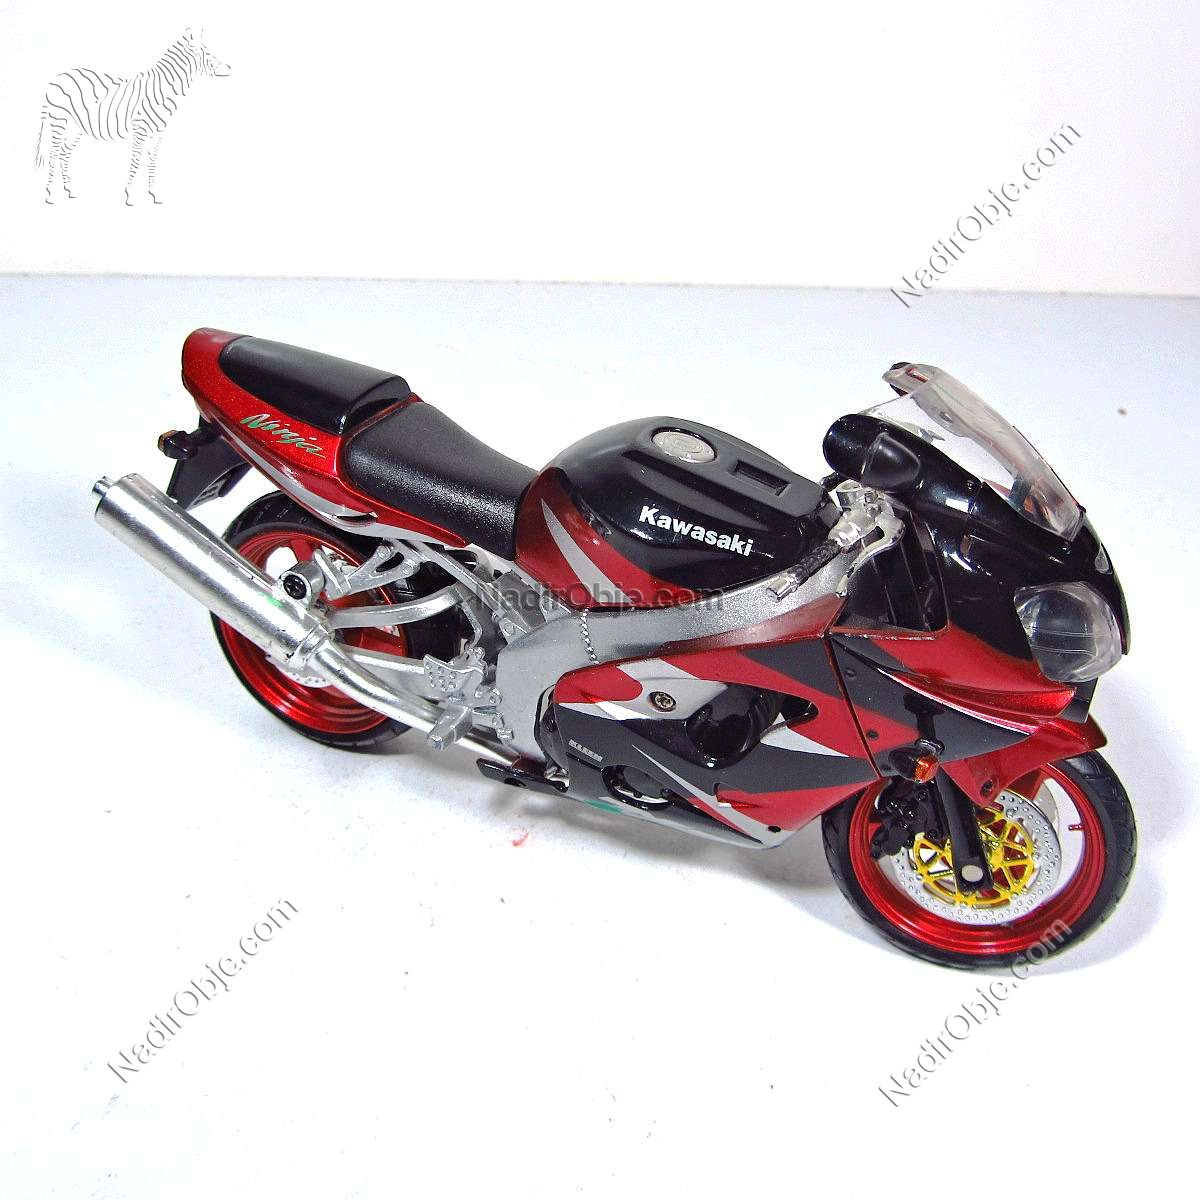 Kawasaki Motorsiklet Mekanik-Elektrikli Objeler Kawasaki